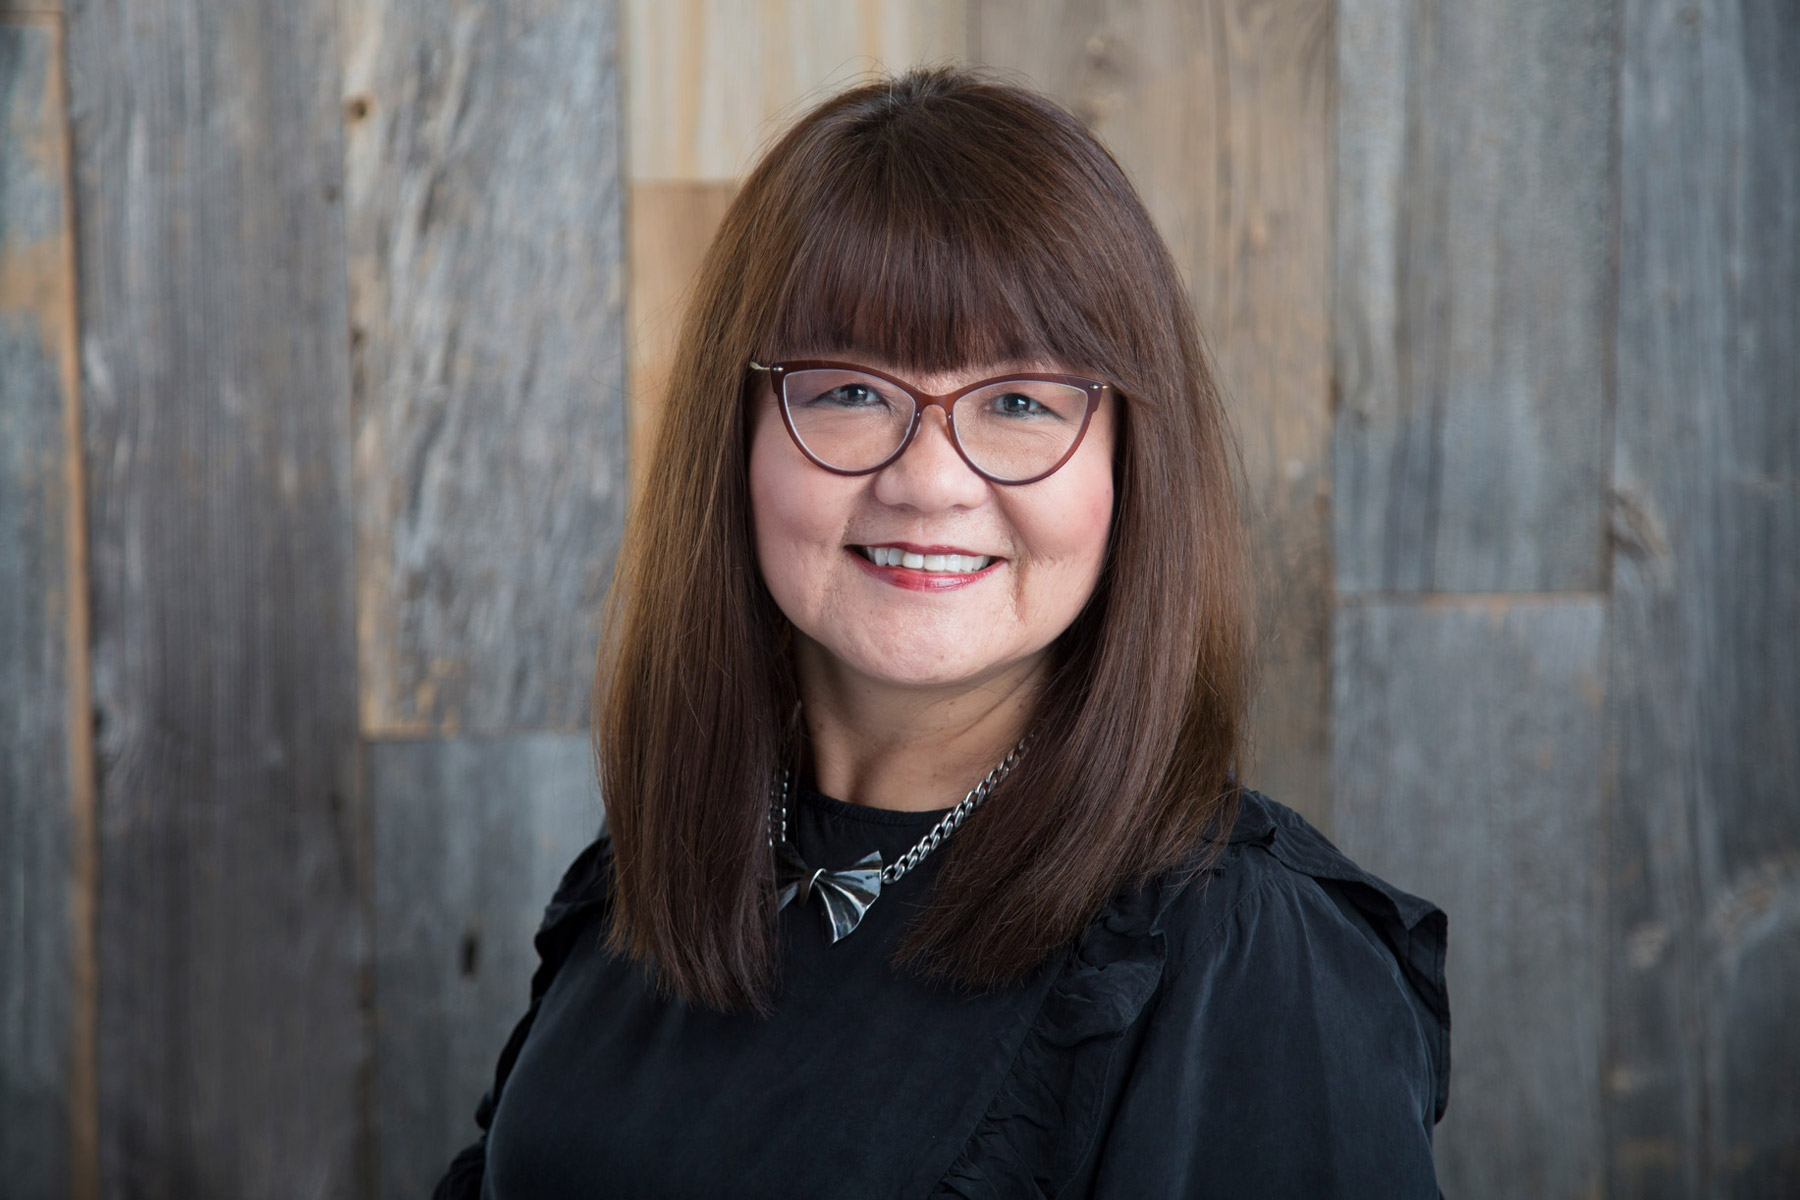 Susy Nagaki-Koc